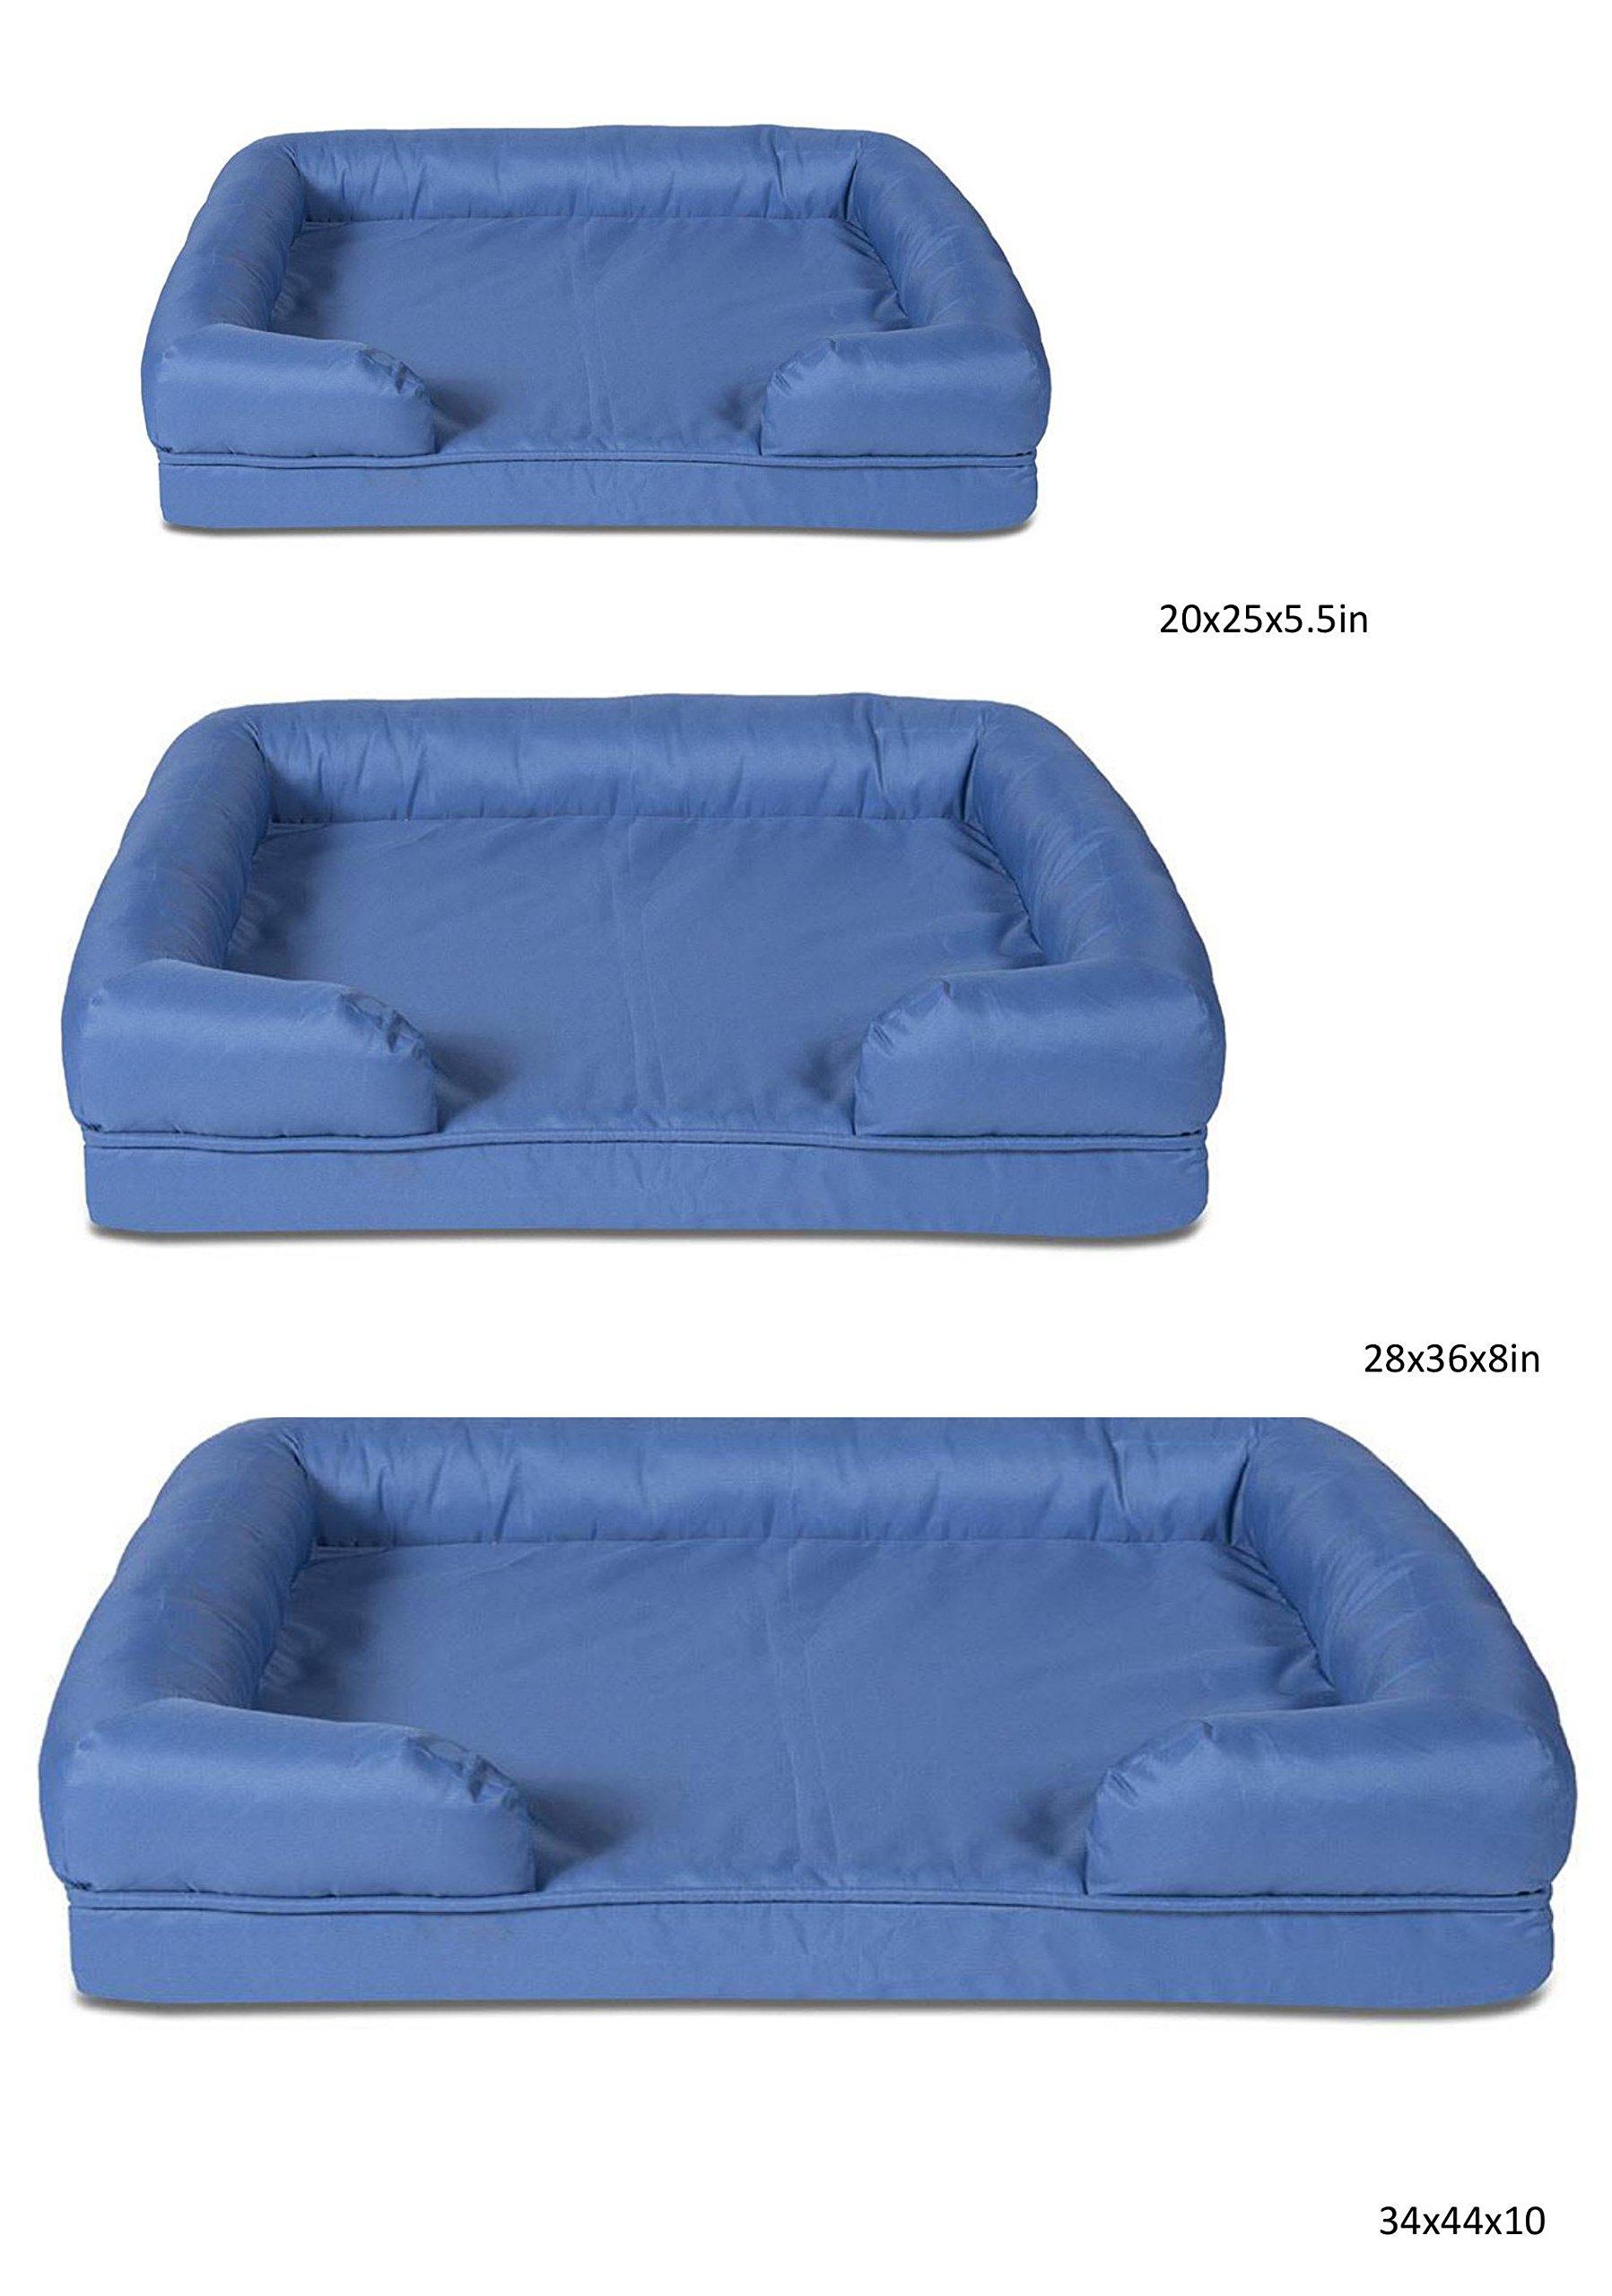 Sleepi Premium Water Resistant Memory Foam Bolster Pet Bed, 28'' x 36'' x 8'', Potting Soil